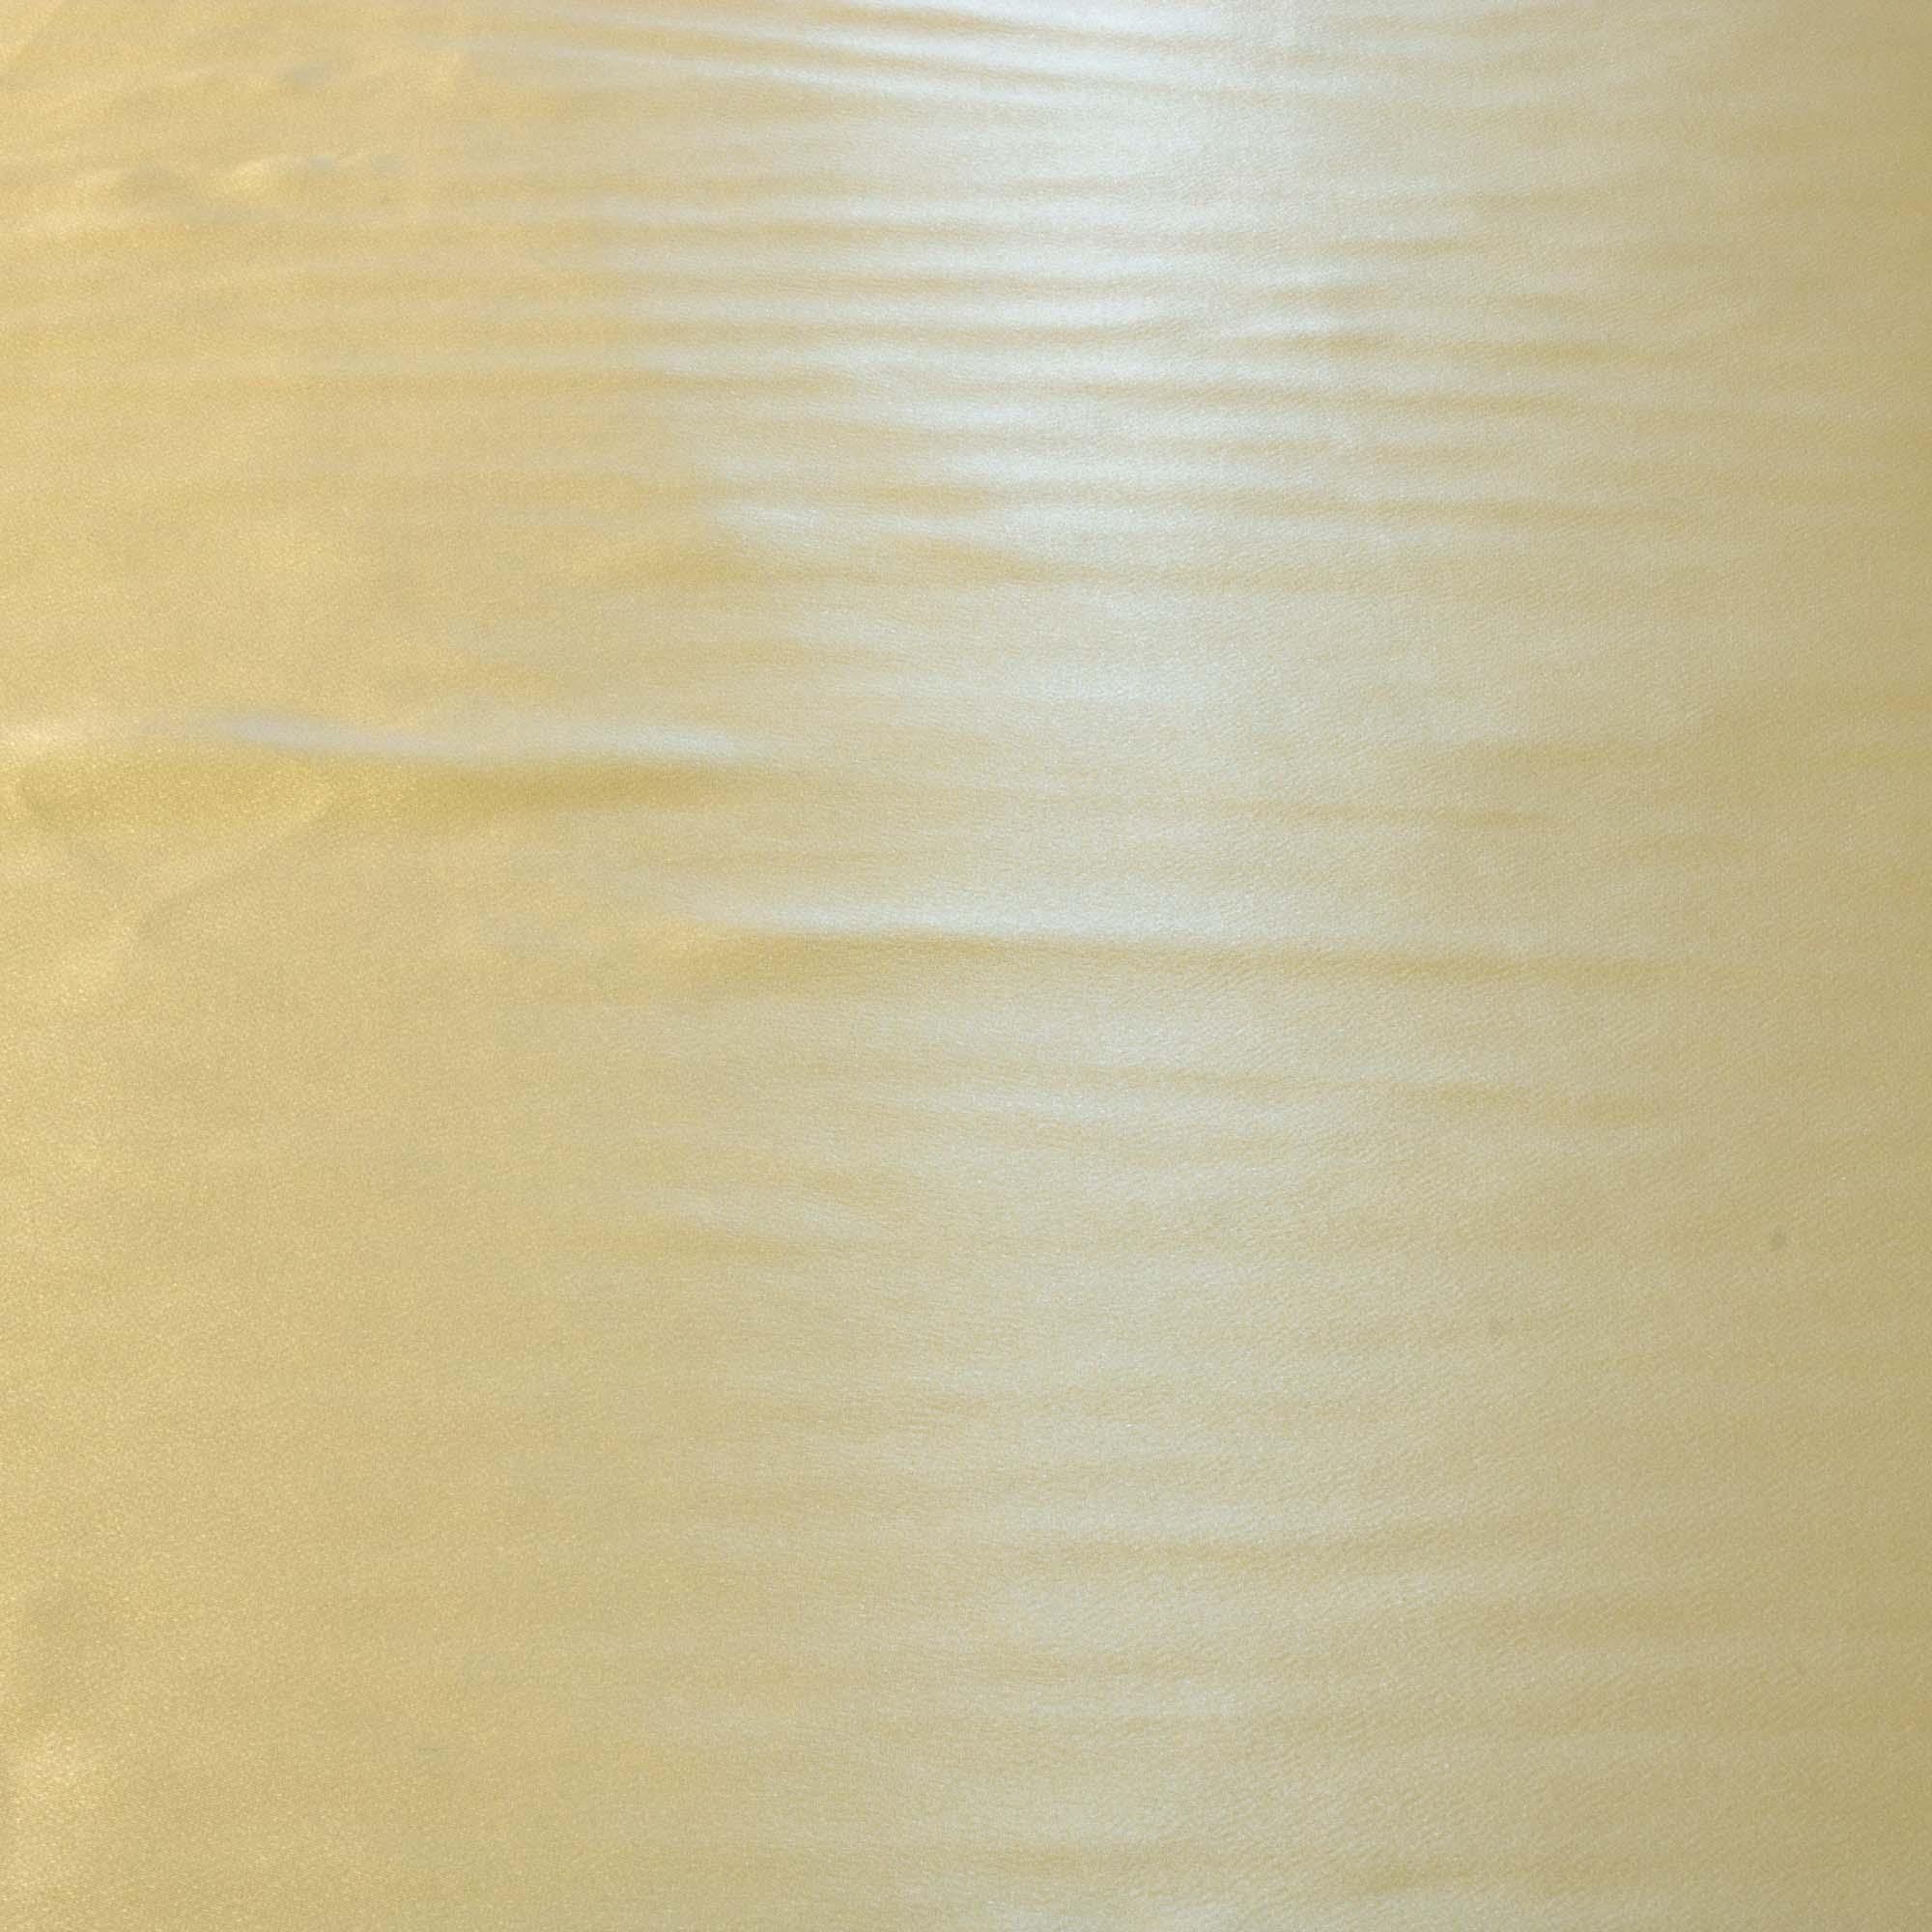 Tecido Crepe Patu Champanhe 100% Poliester 1,40 m Largura